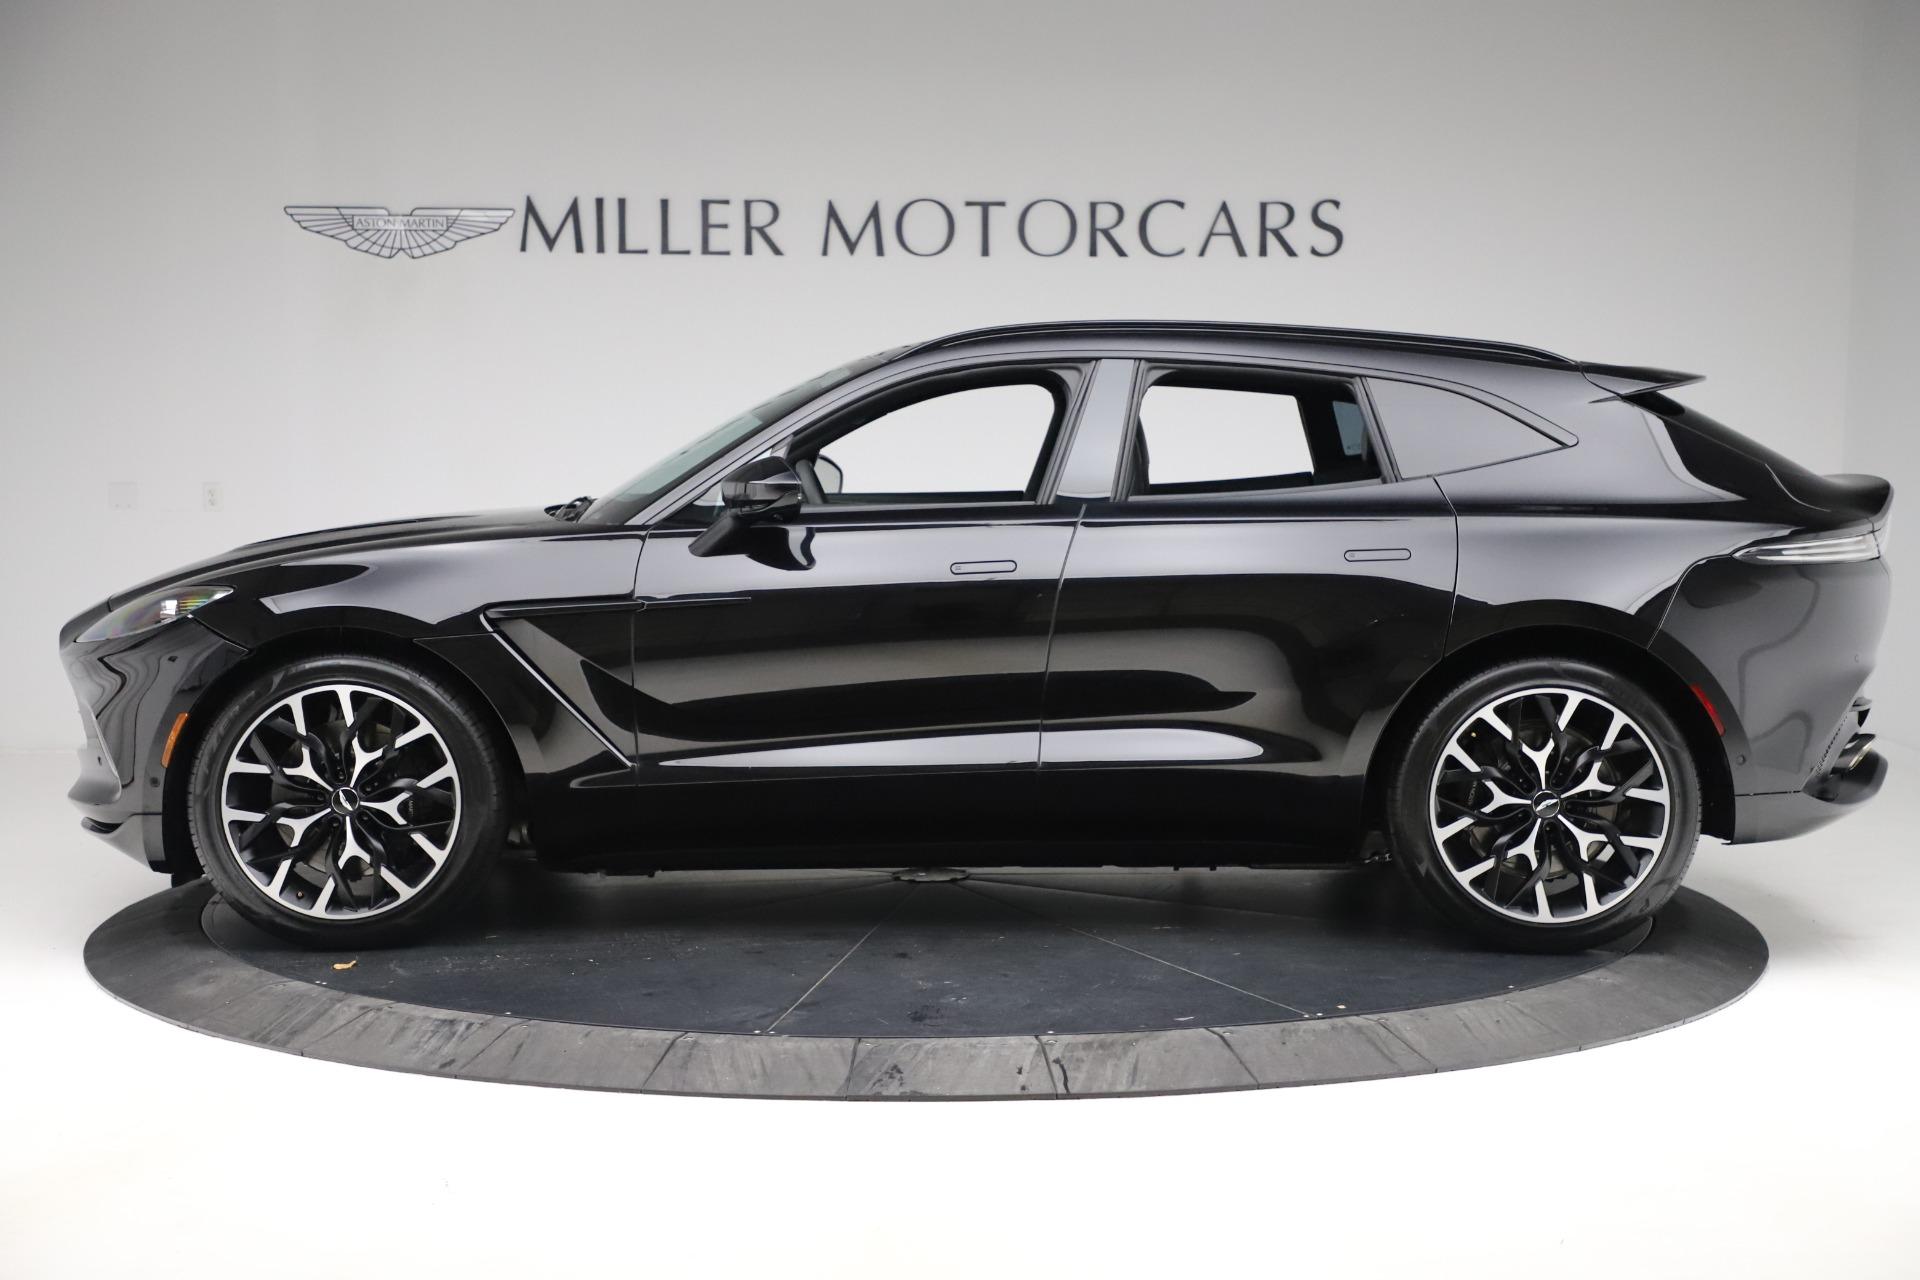 2020 Aston Martin Dbx Suv Miller Motorcars United States For Sale On Luxurypulse